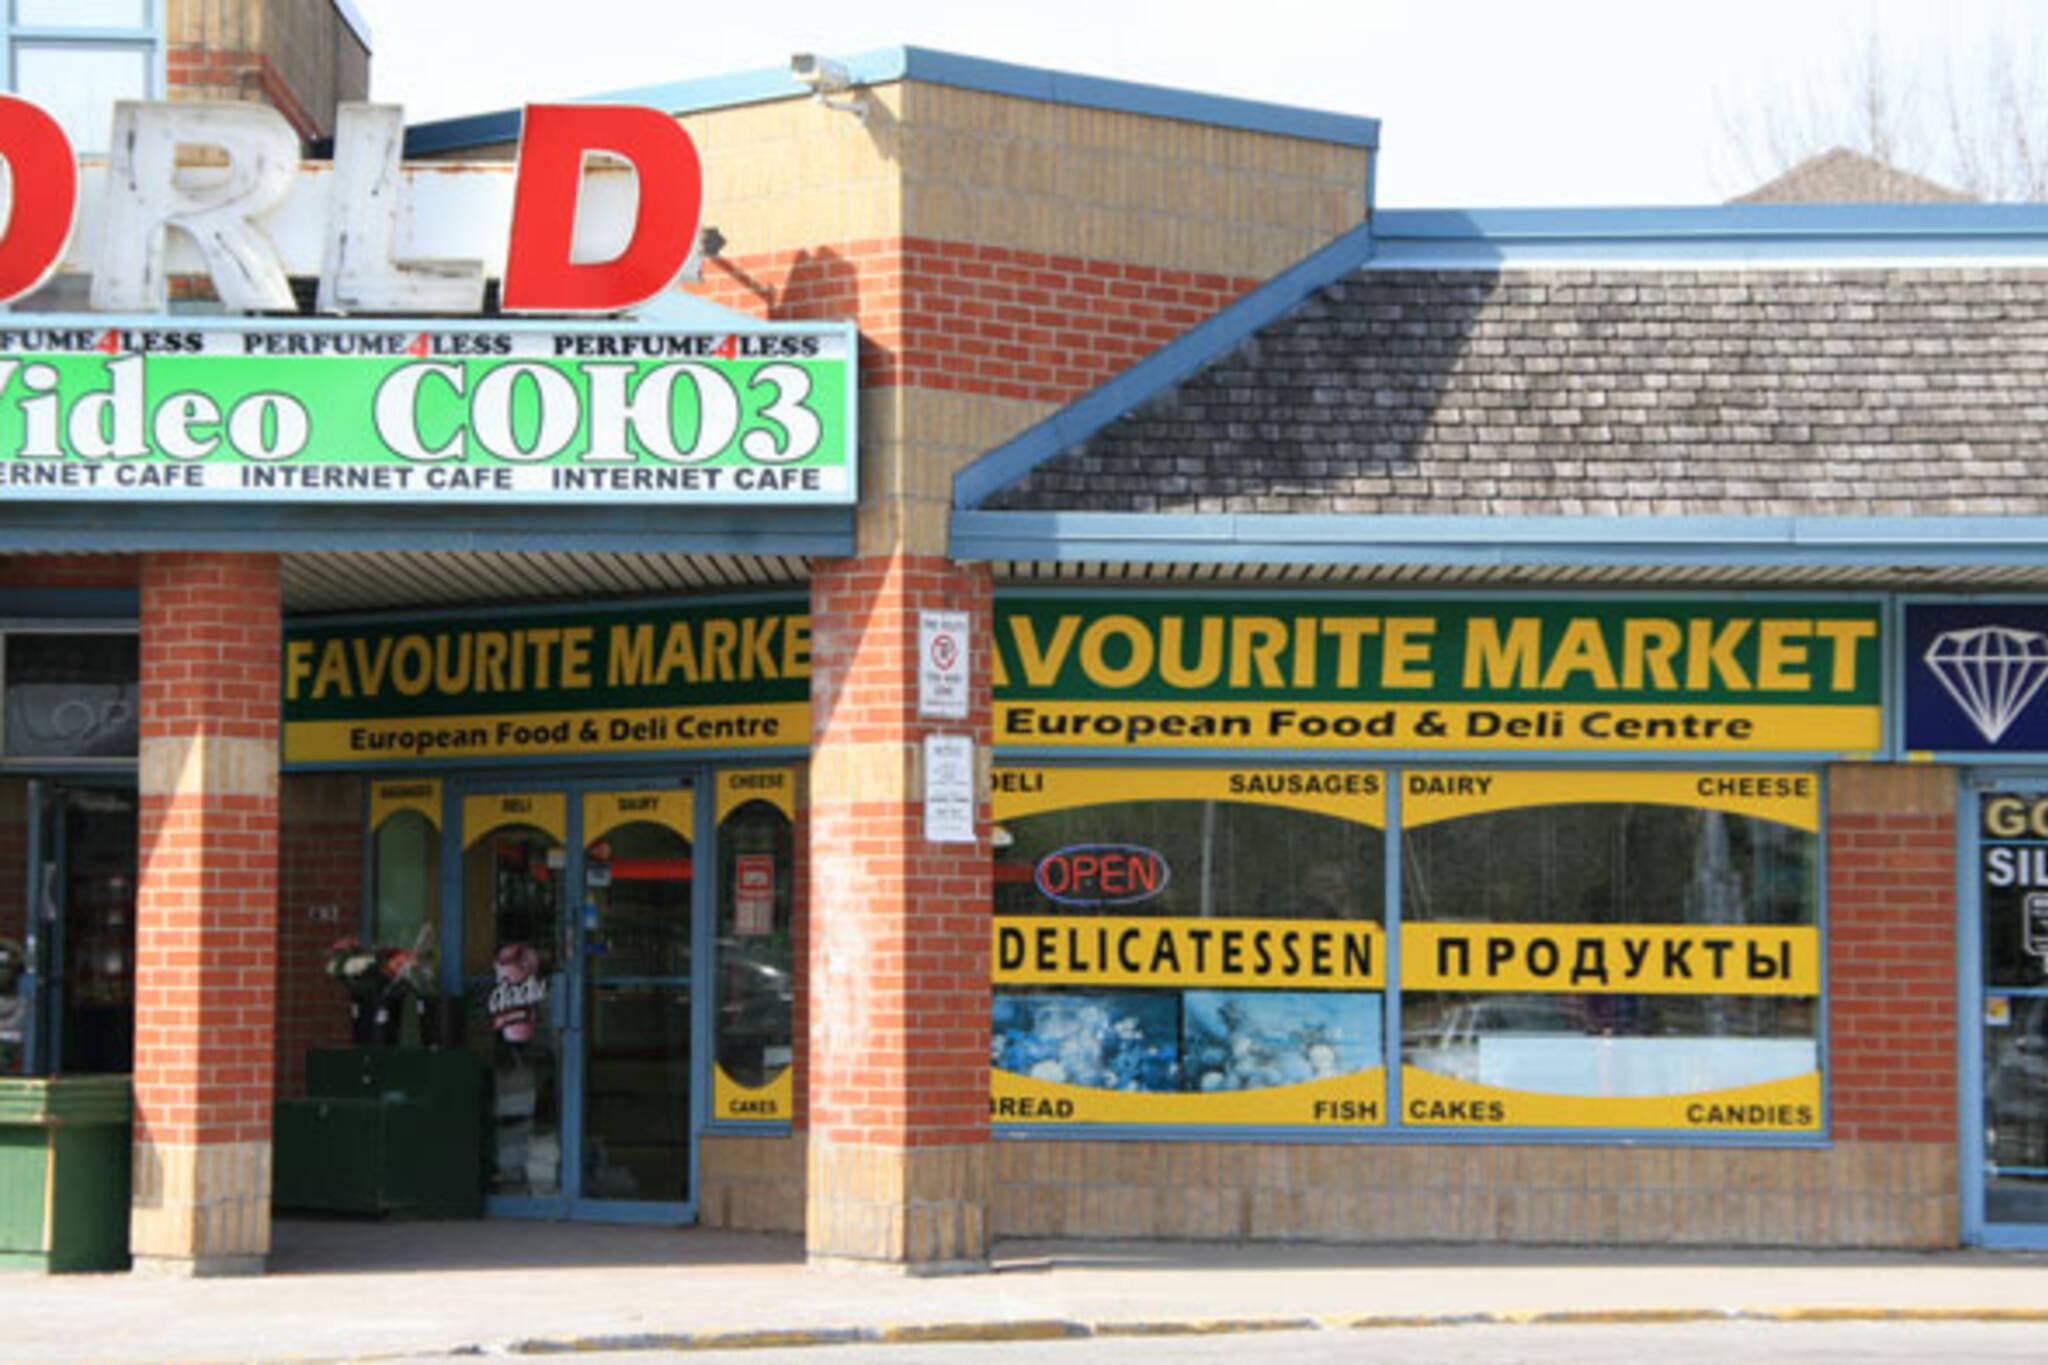 Favourite Market